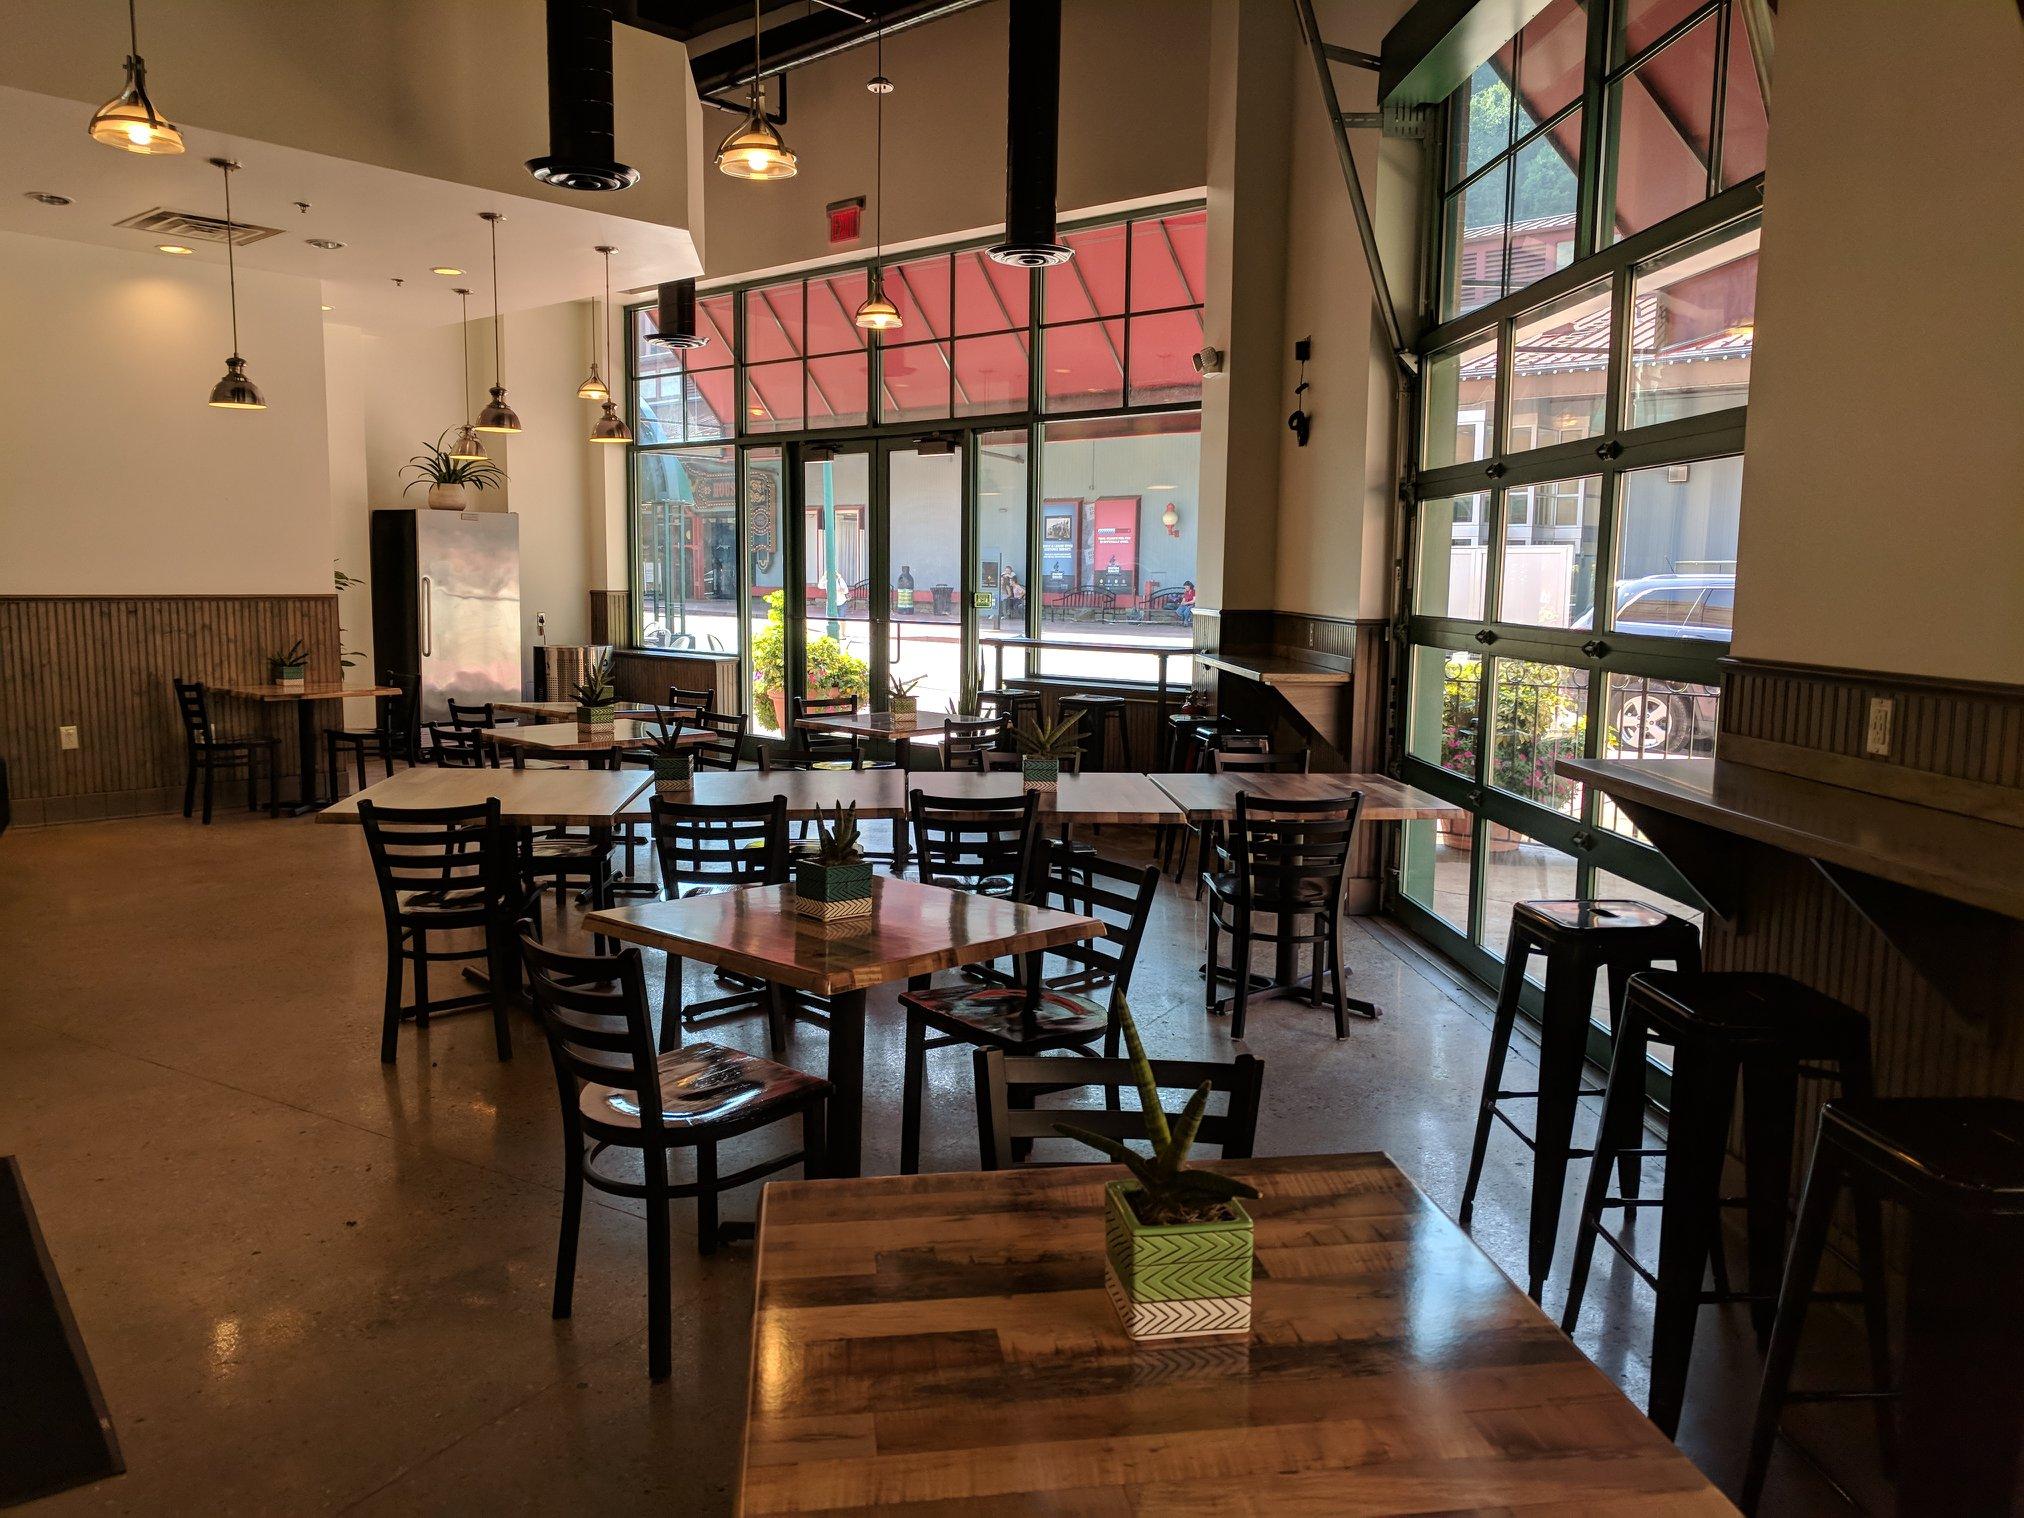 Local Restaurants Near Me: Restaurant Pittsburgh, PA